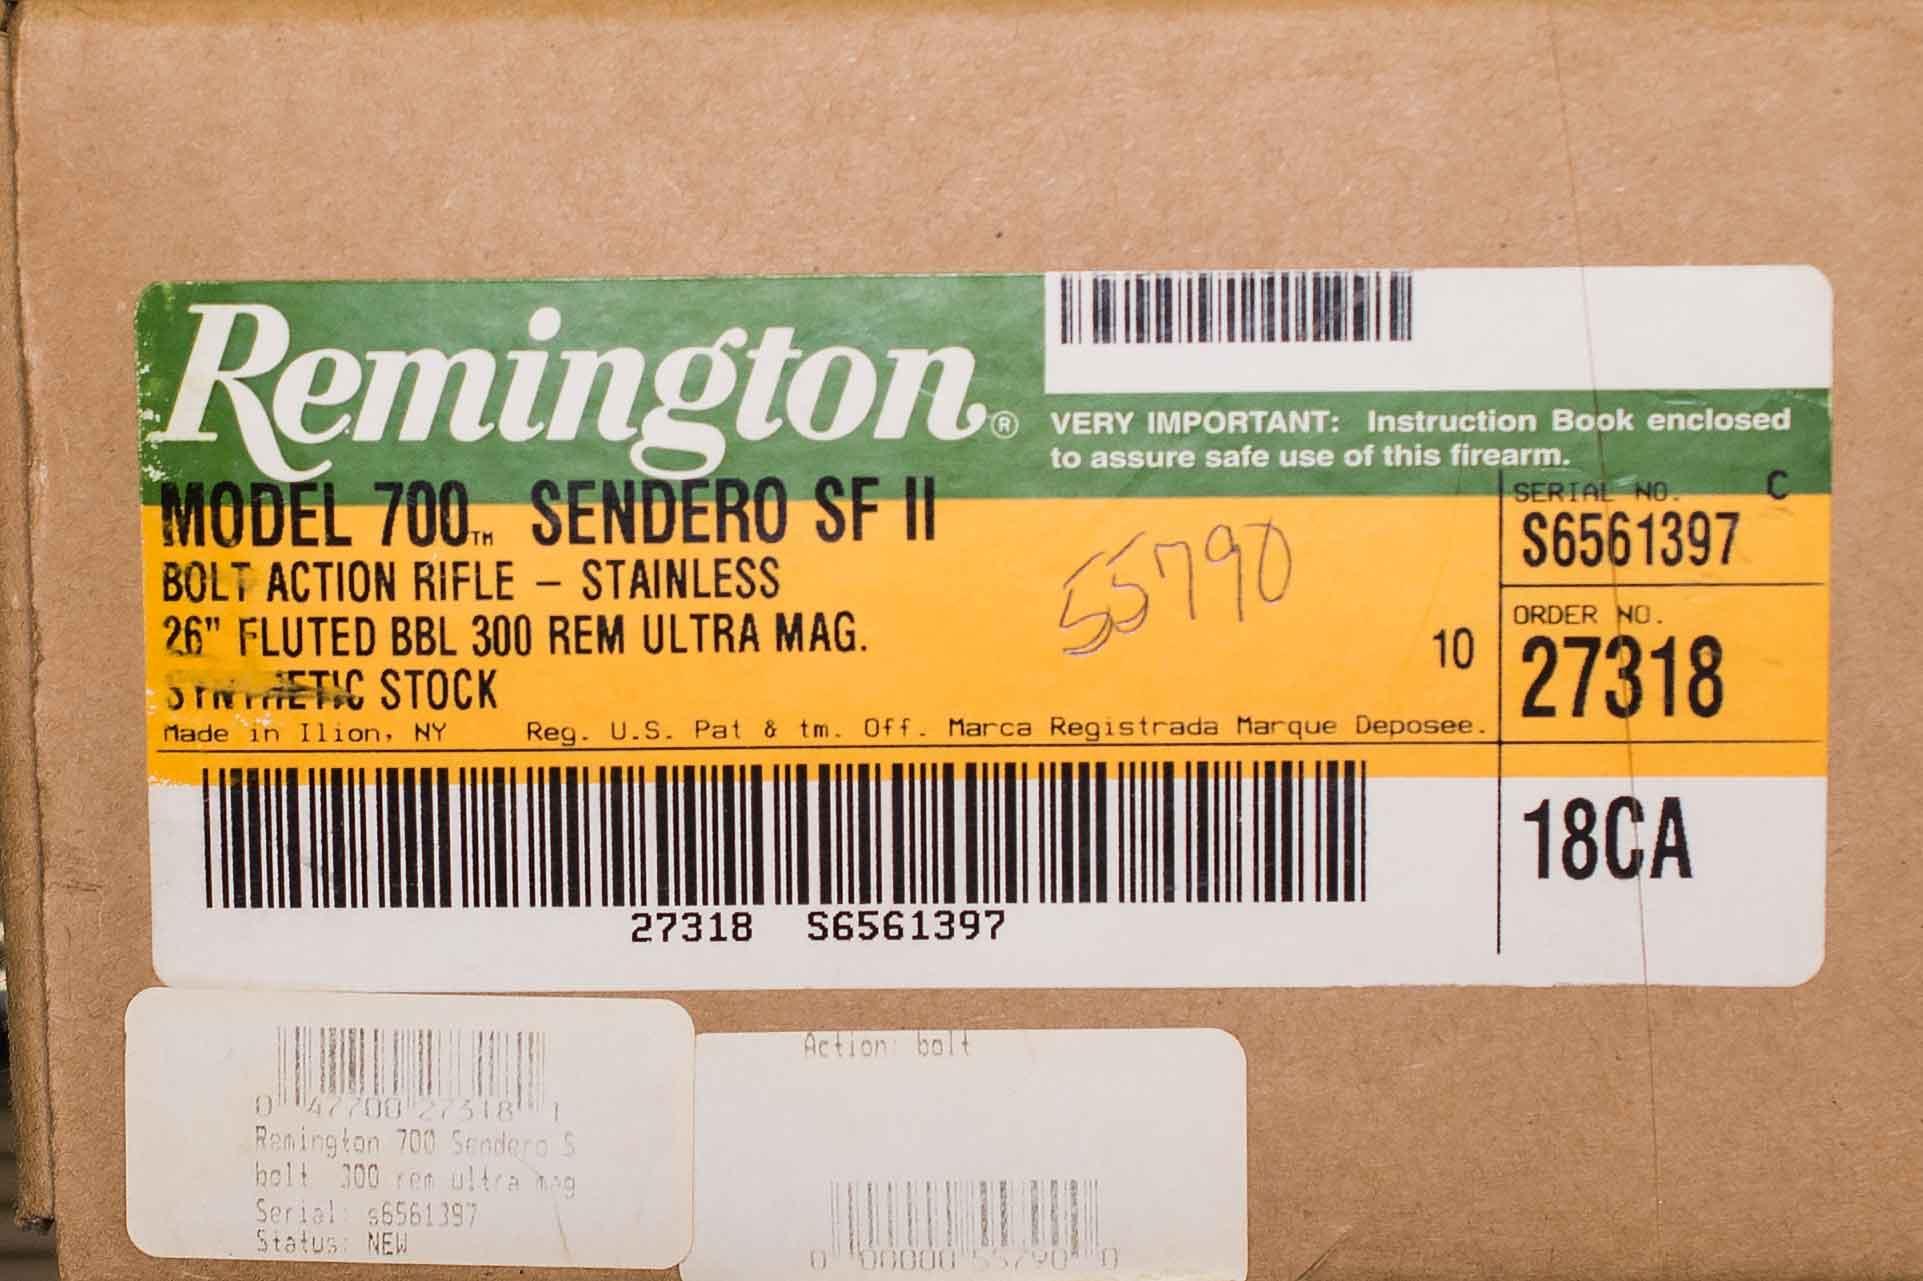 REMINGTON MODEL 700 SENDERO SF II (Auction ID: 11296681, End